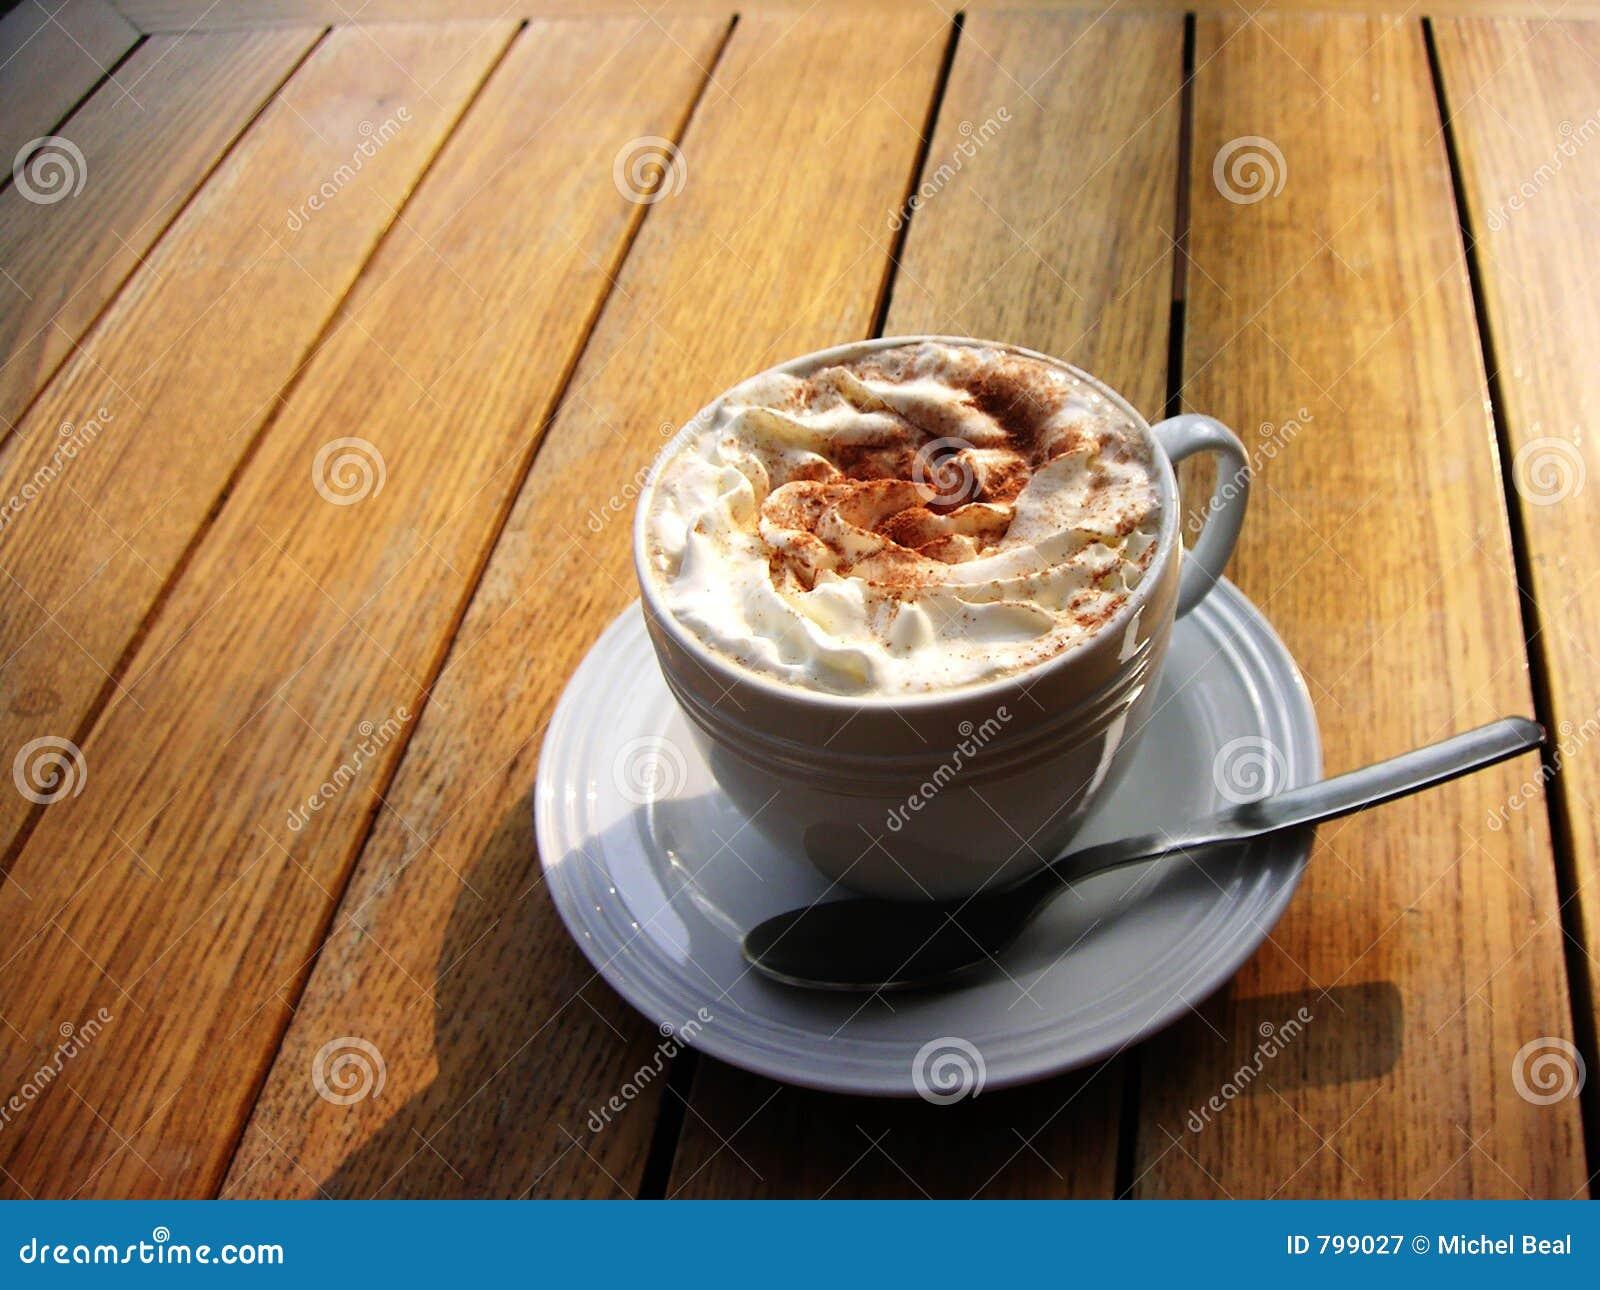 Sweets cofee